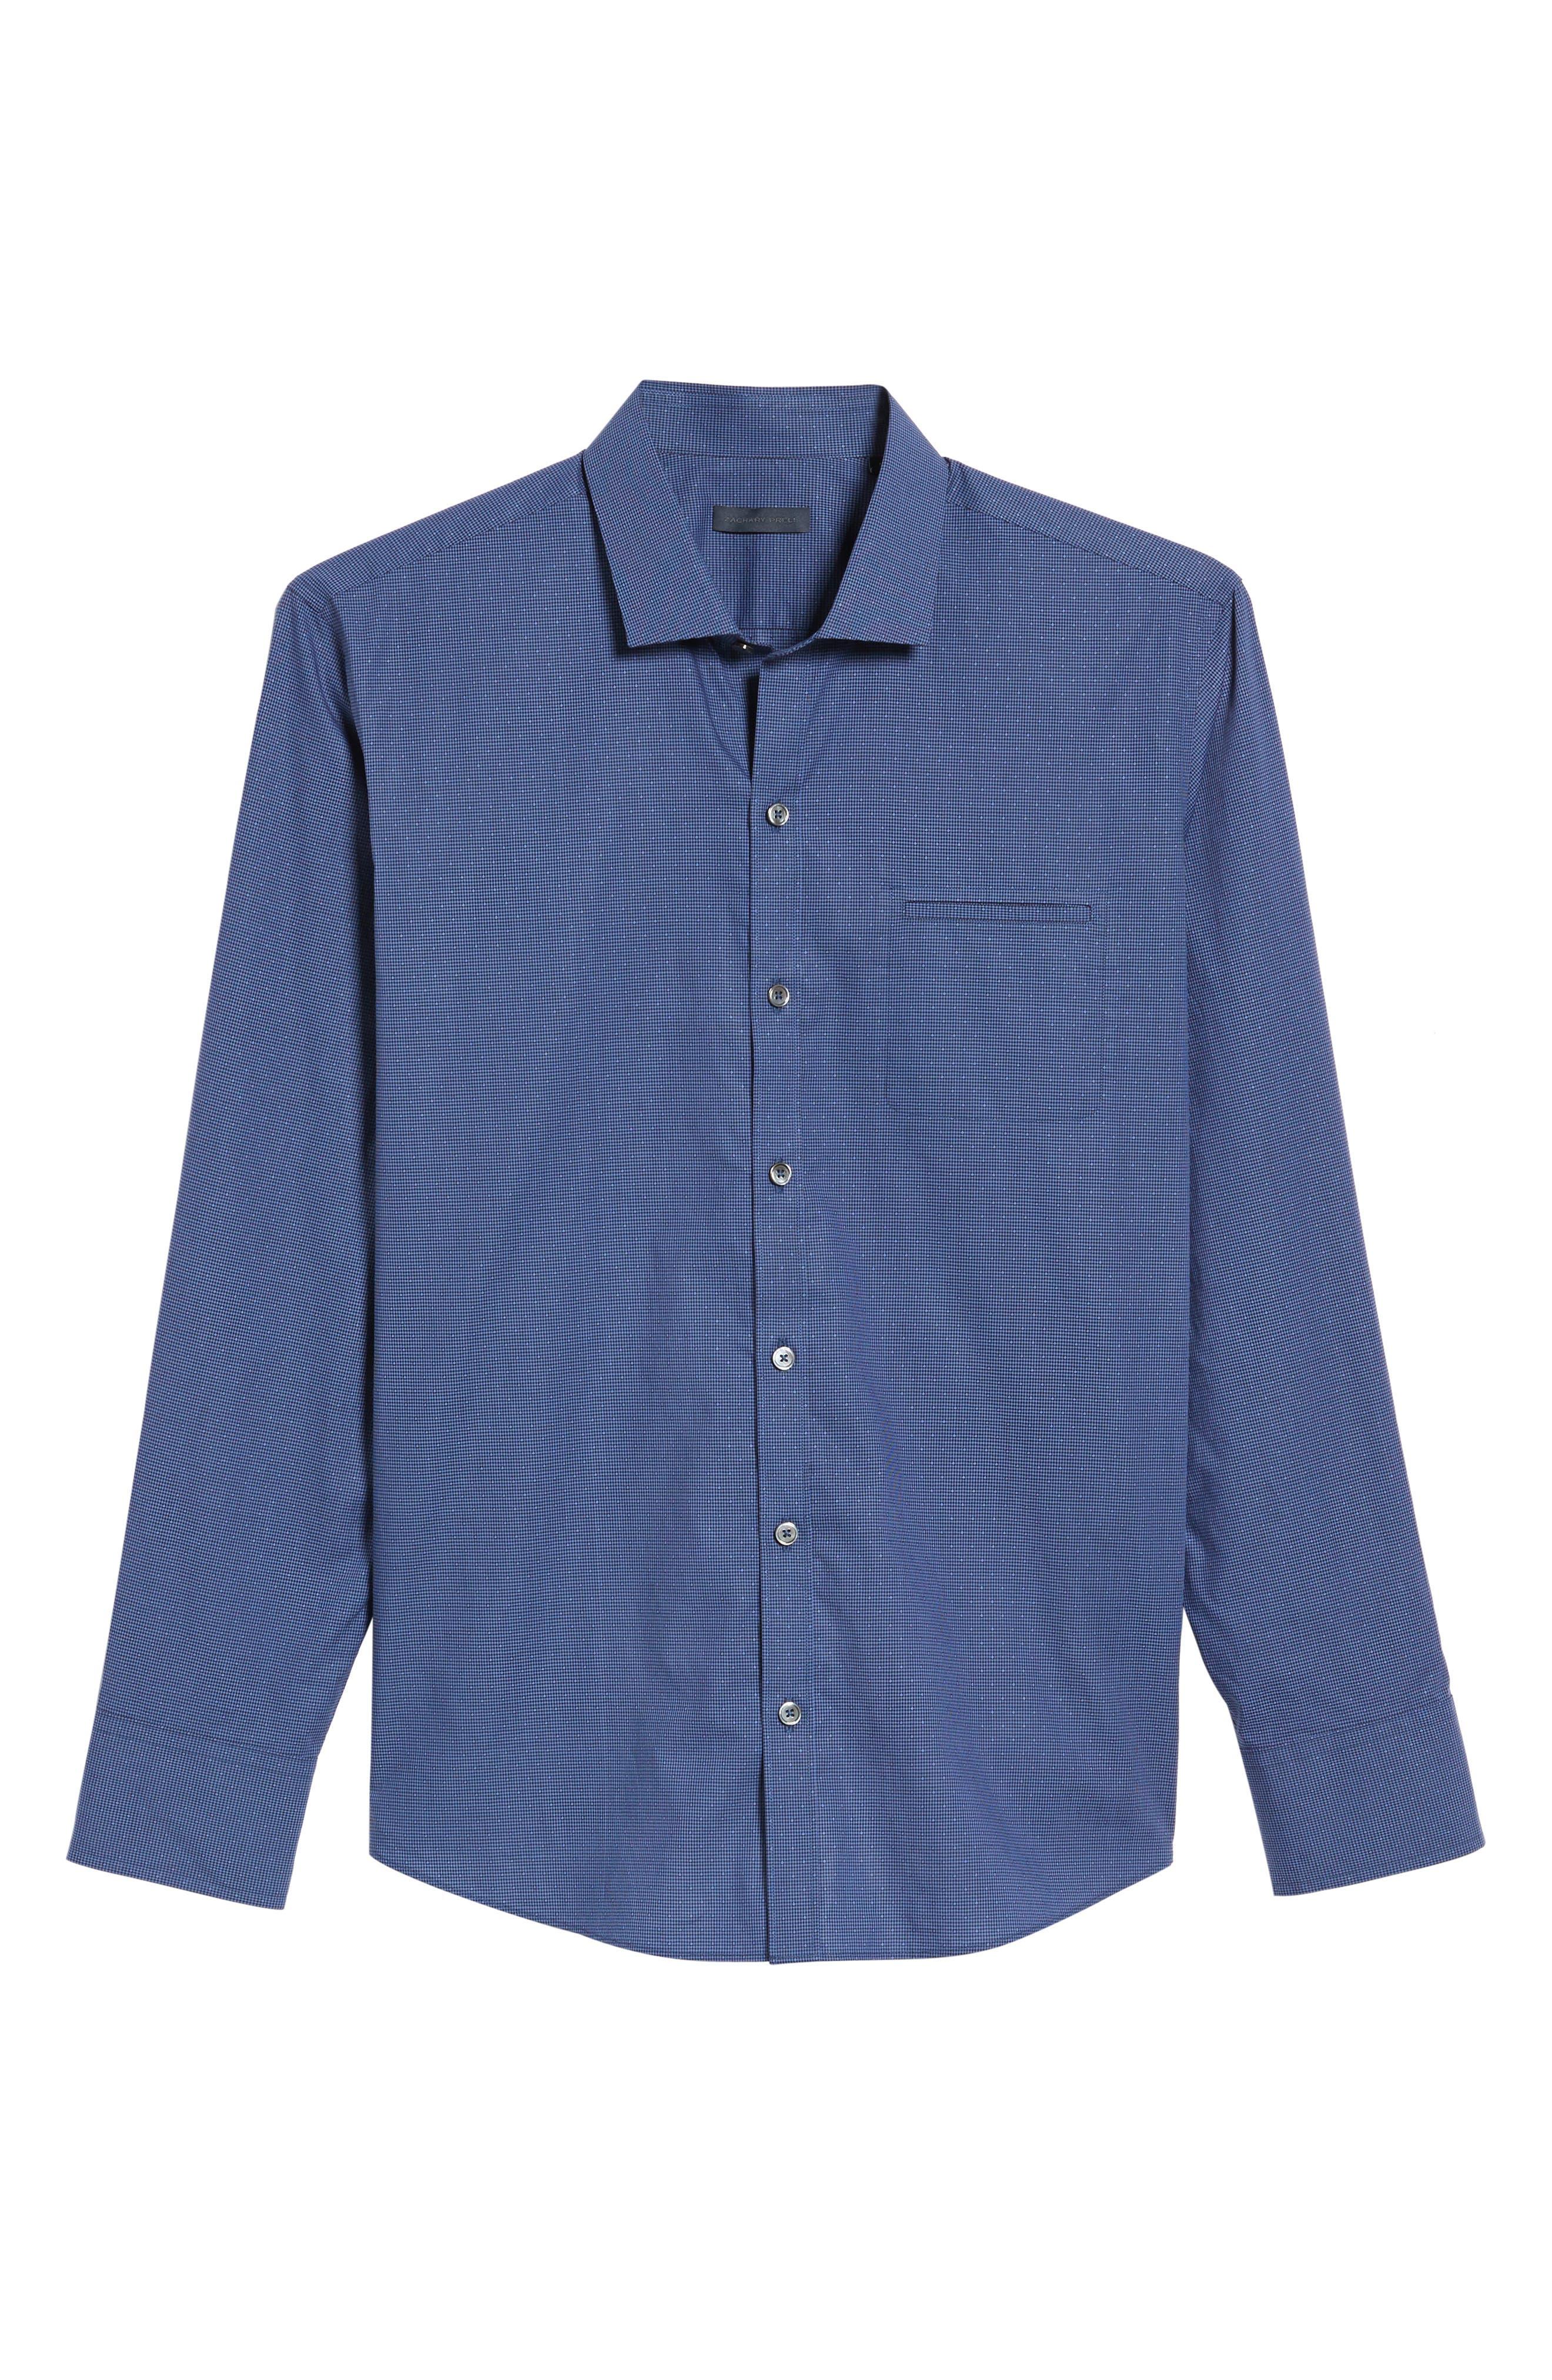 Galileo Dobby Microcheck Sport Shirt,                             Alternate thumbnail 6, color,                             Navy